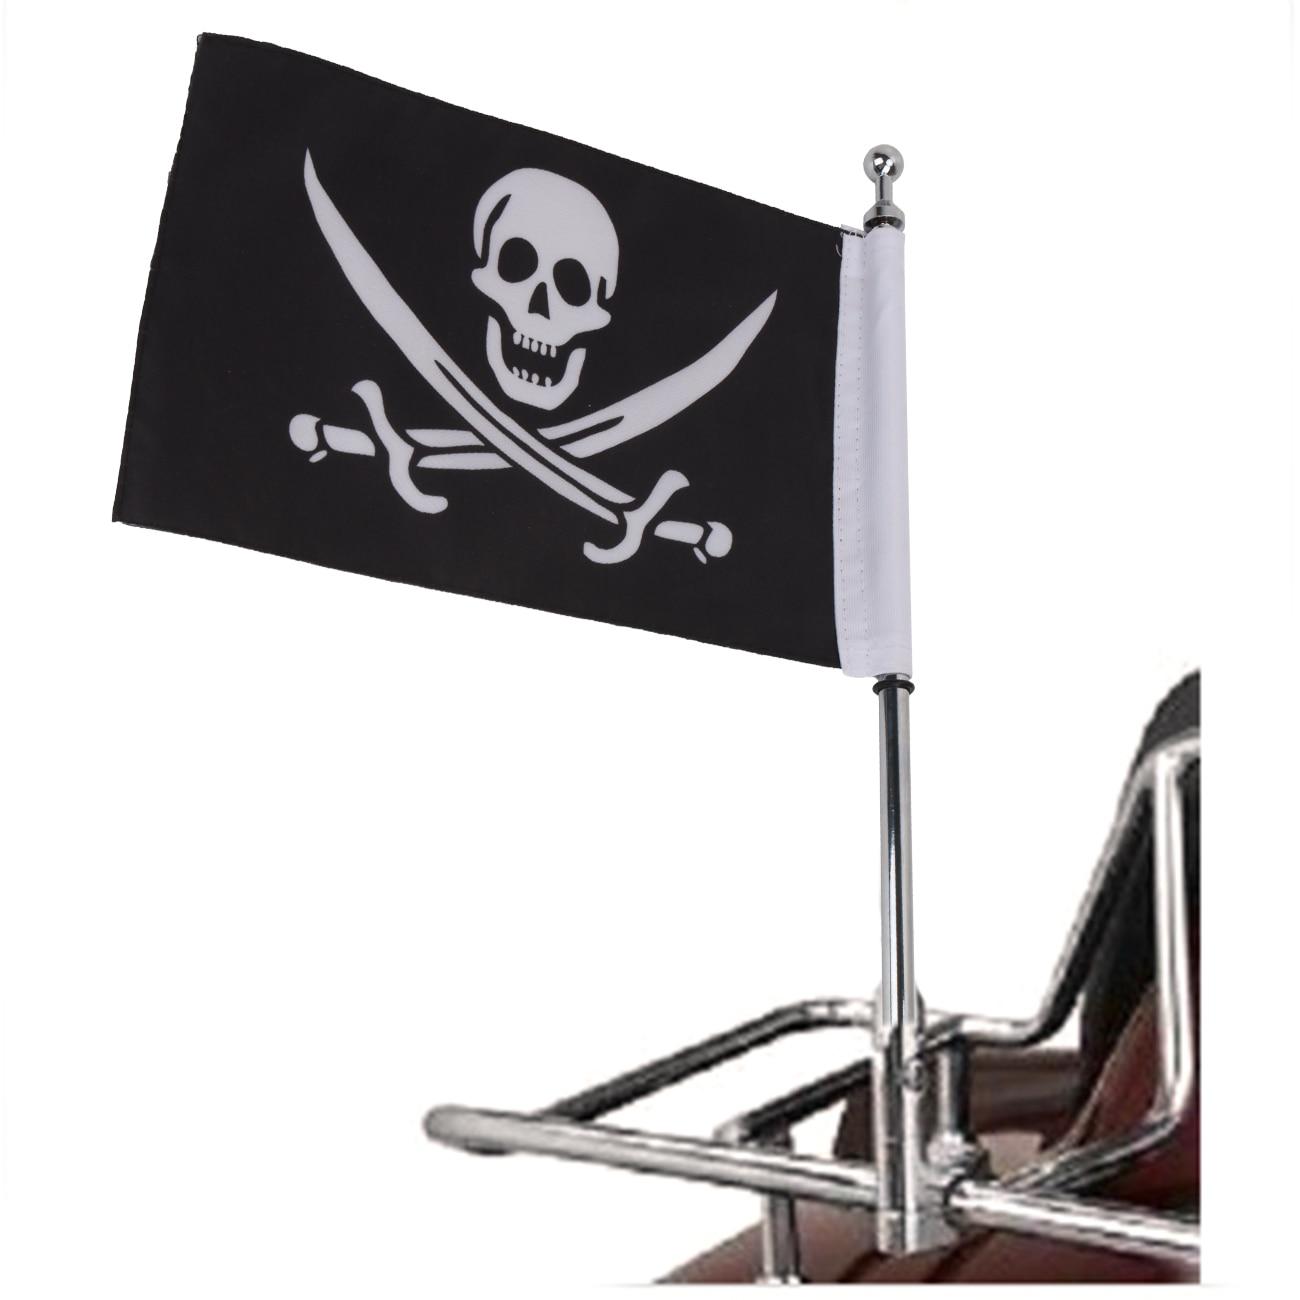 Cool Skull Pirate Flag Motorcycle Bike Rear Mount Flag Pole Adjustable Mounting Bracket For Harley Yamaha Honda #MBG001-C bmbe табурет pirate